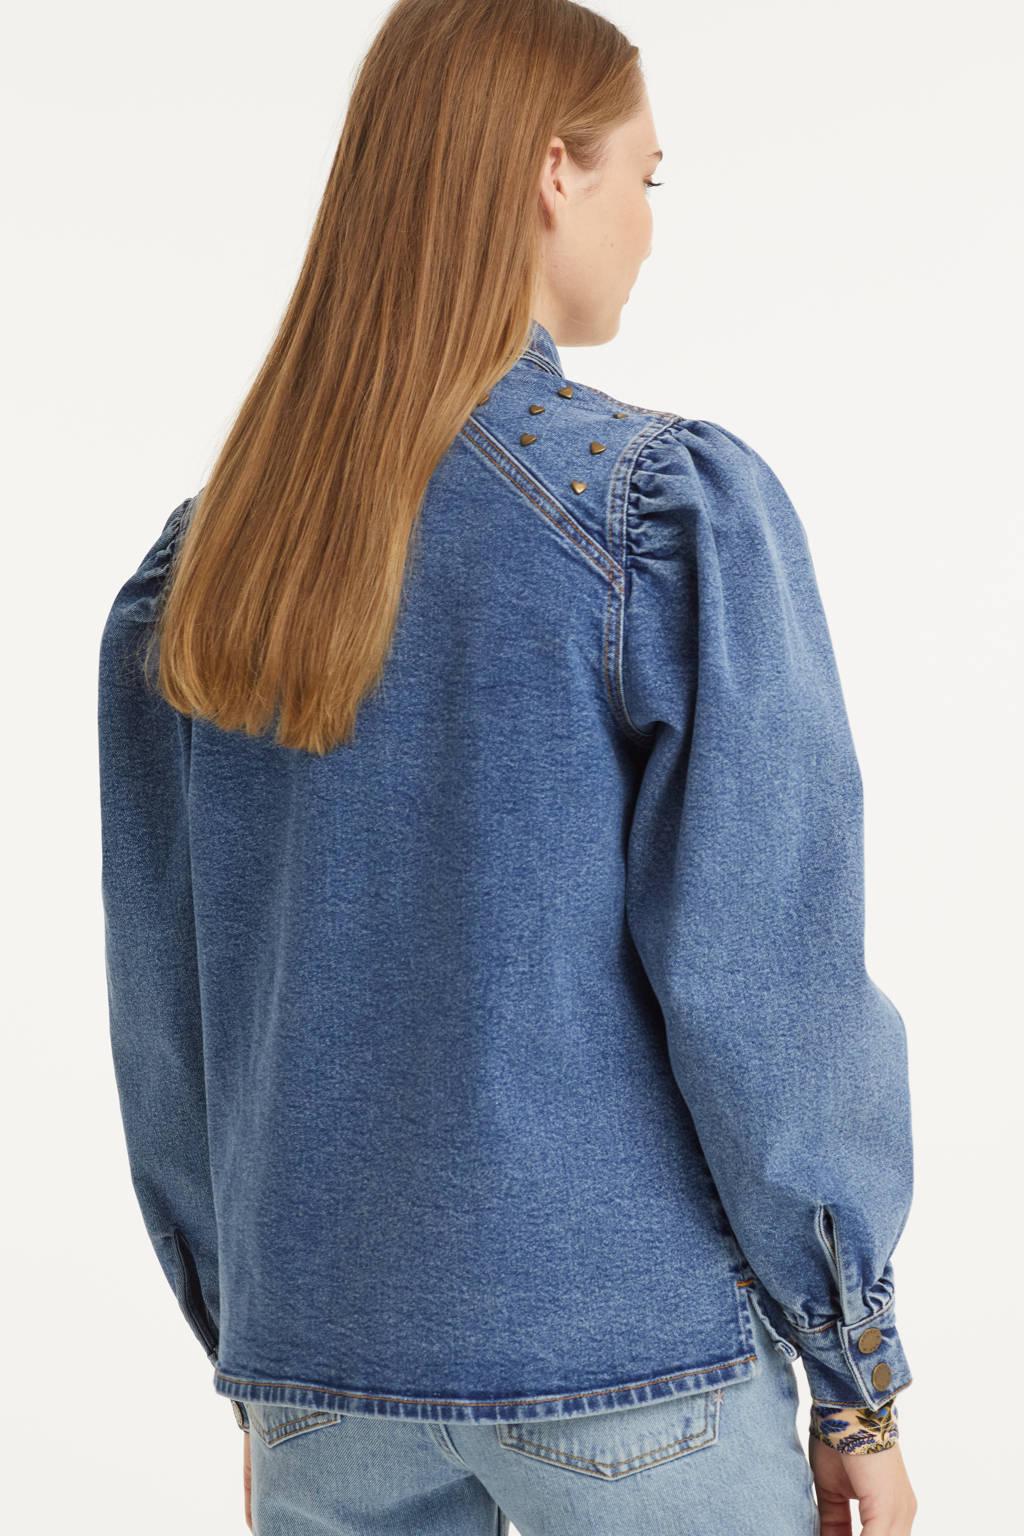 HARPER & YVE geweven blouse Cara met studs blue